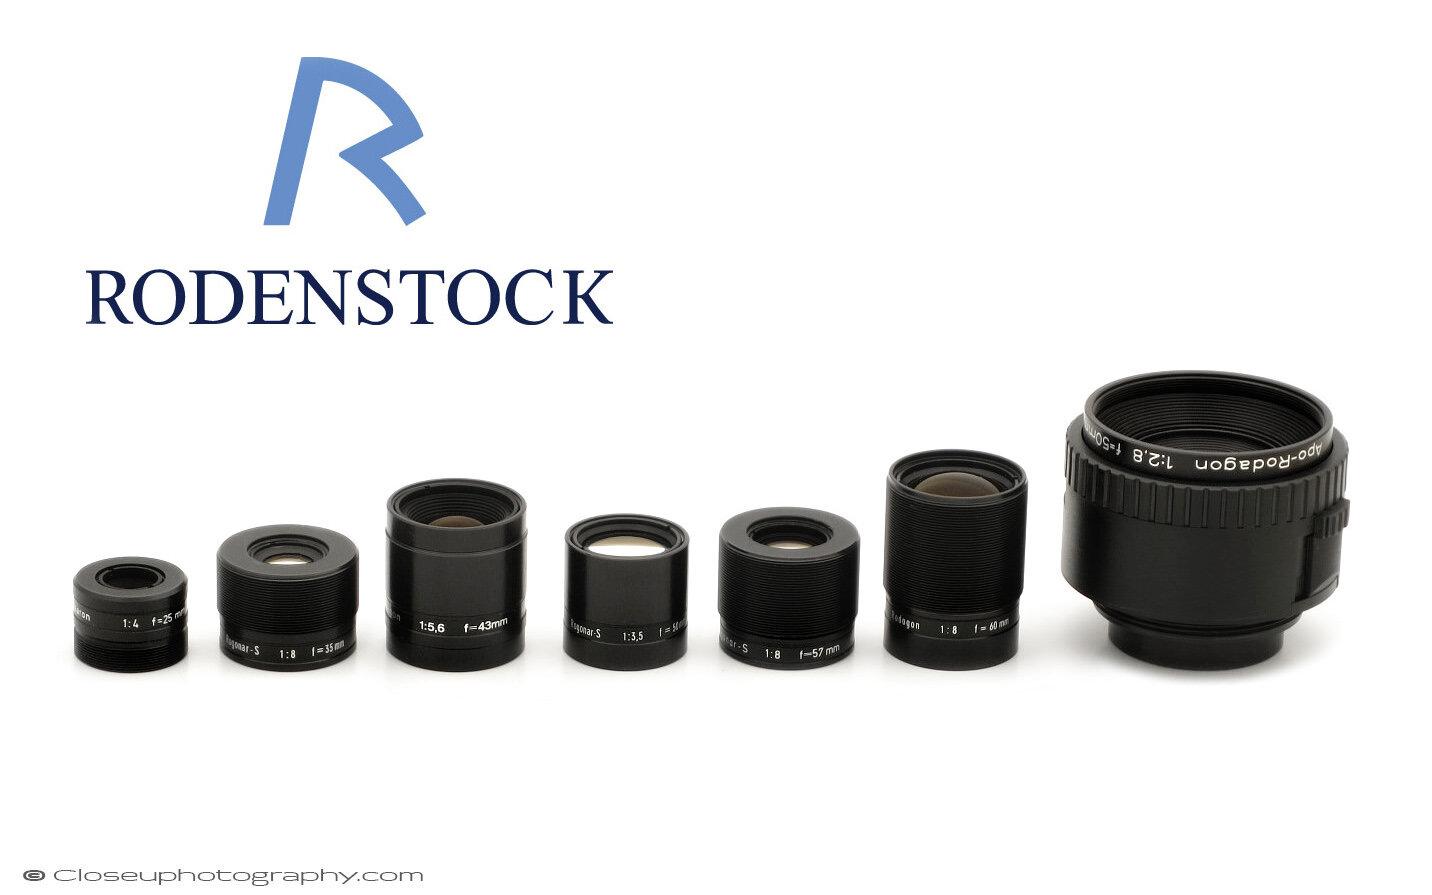 Rodenstock-Industrial-lenses-www-Closeuphotography-com.jpg